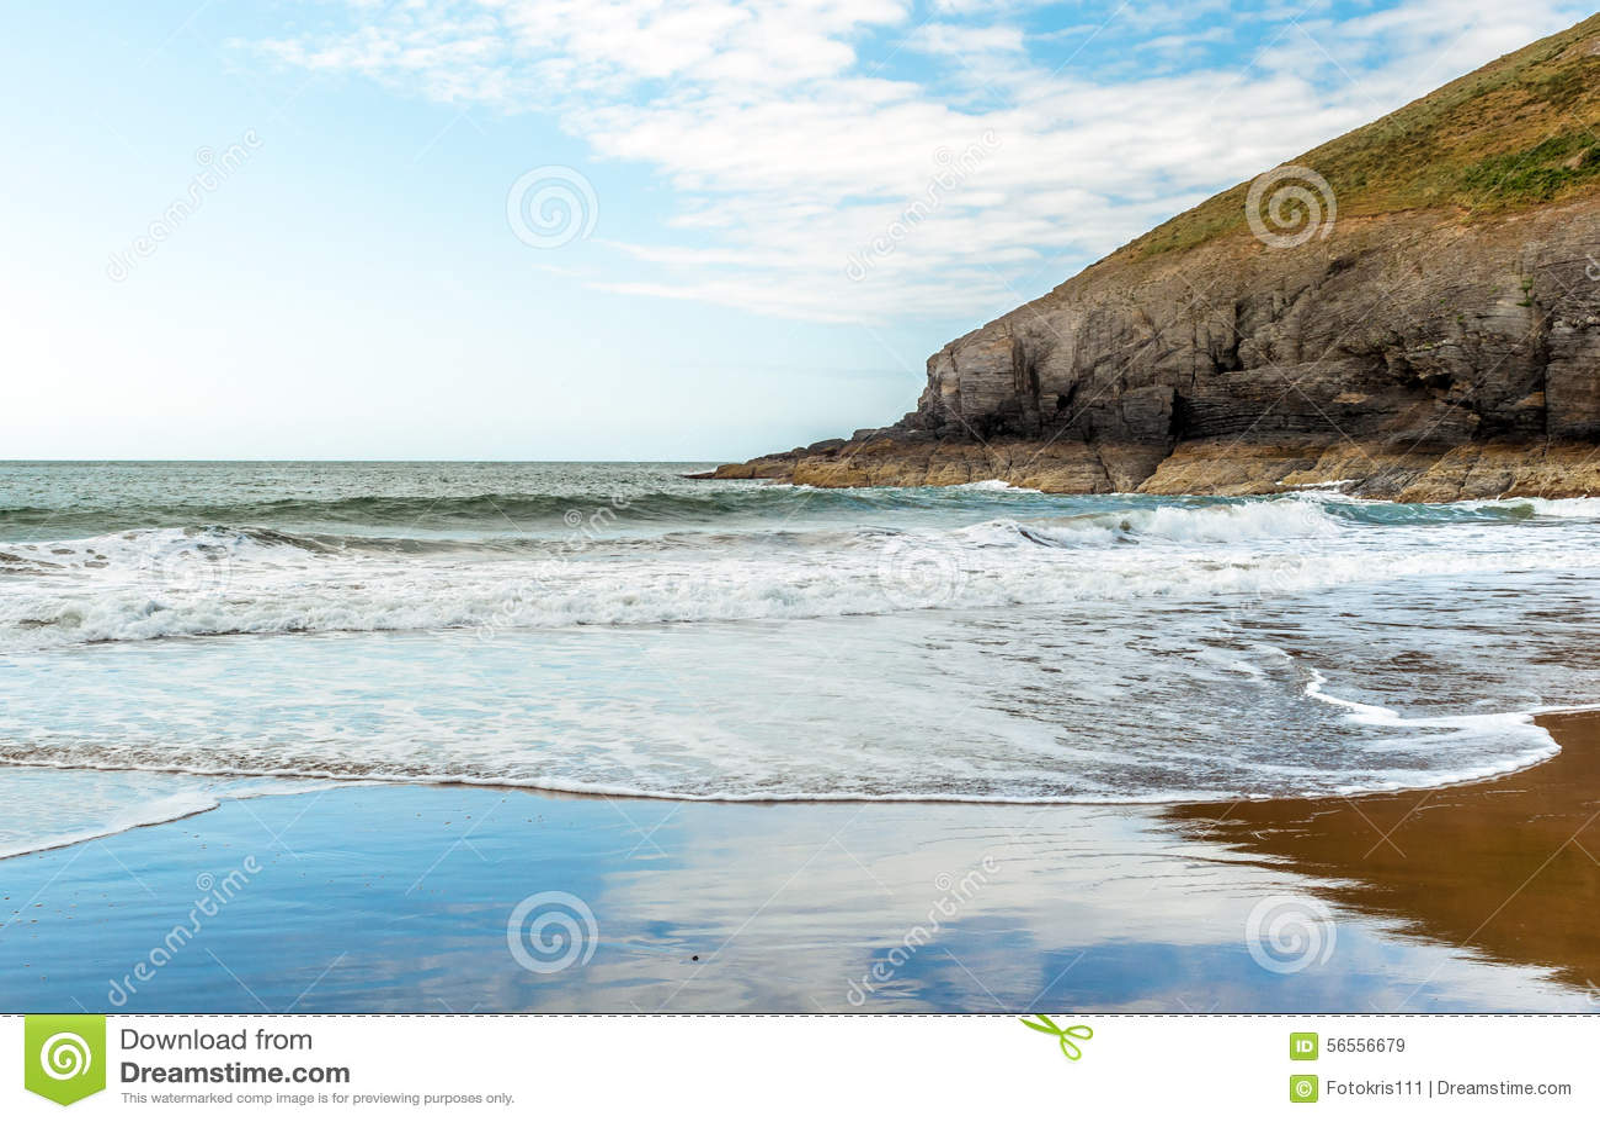 Download Θάλασσα ουρανού και σύννεφα και απότομοι βράχοι Στοκ Εικόνα - εικόνα από ενωμένος, άμμος: 56556679